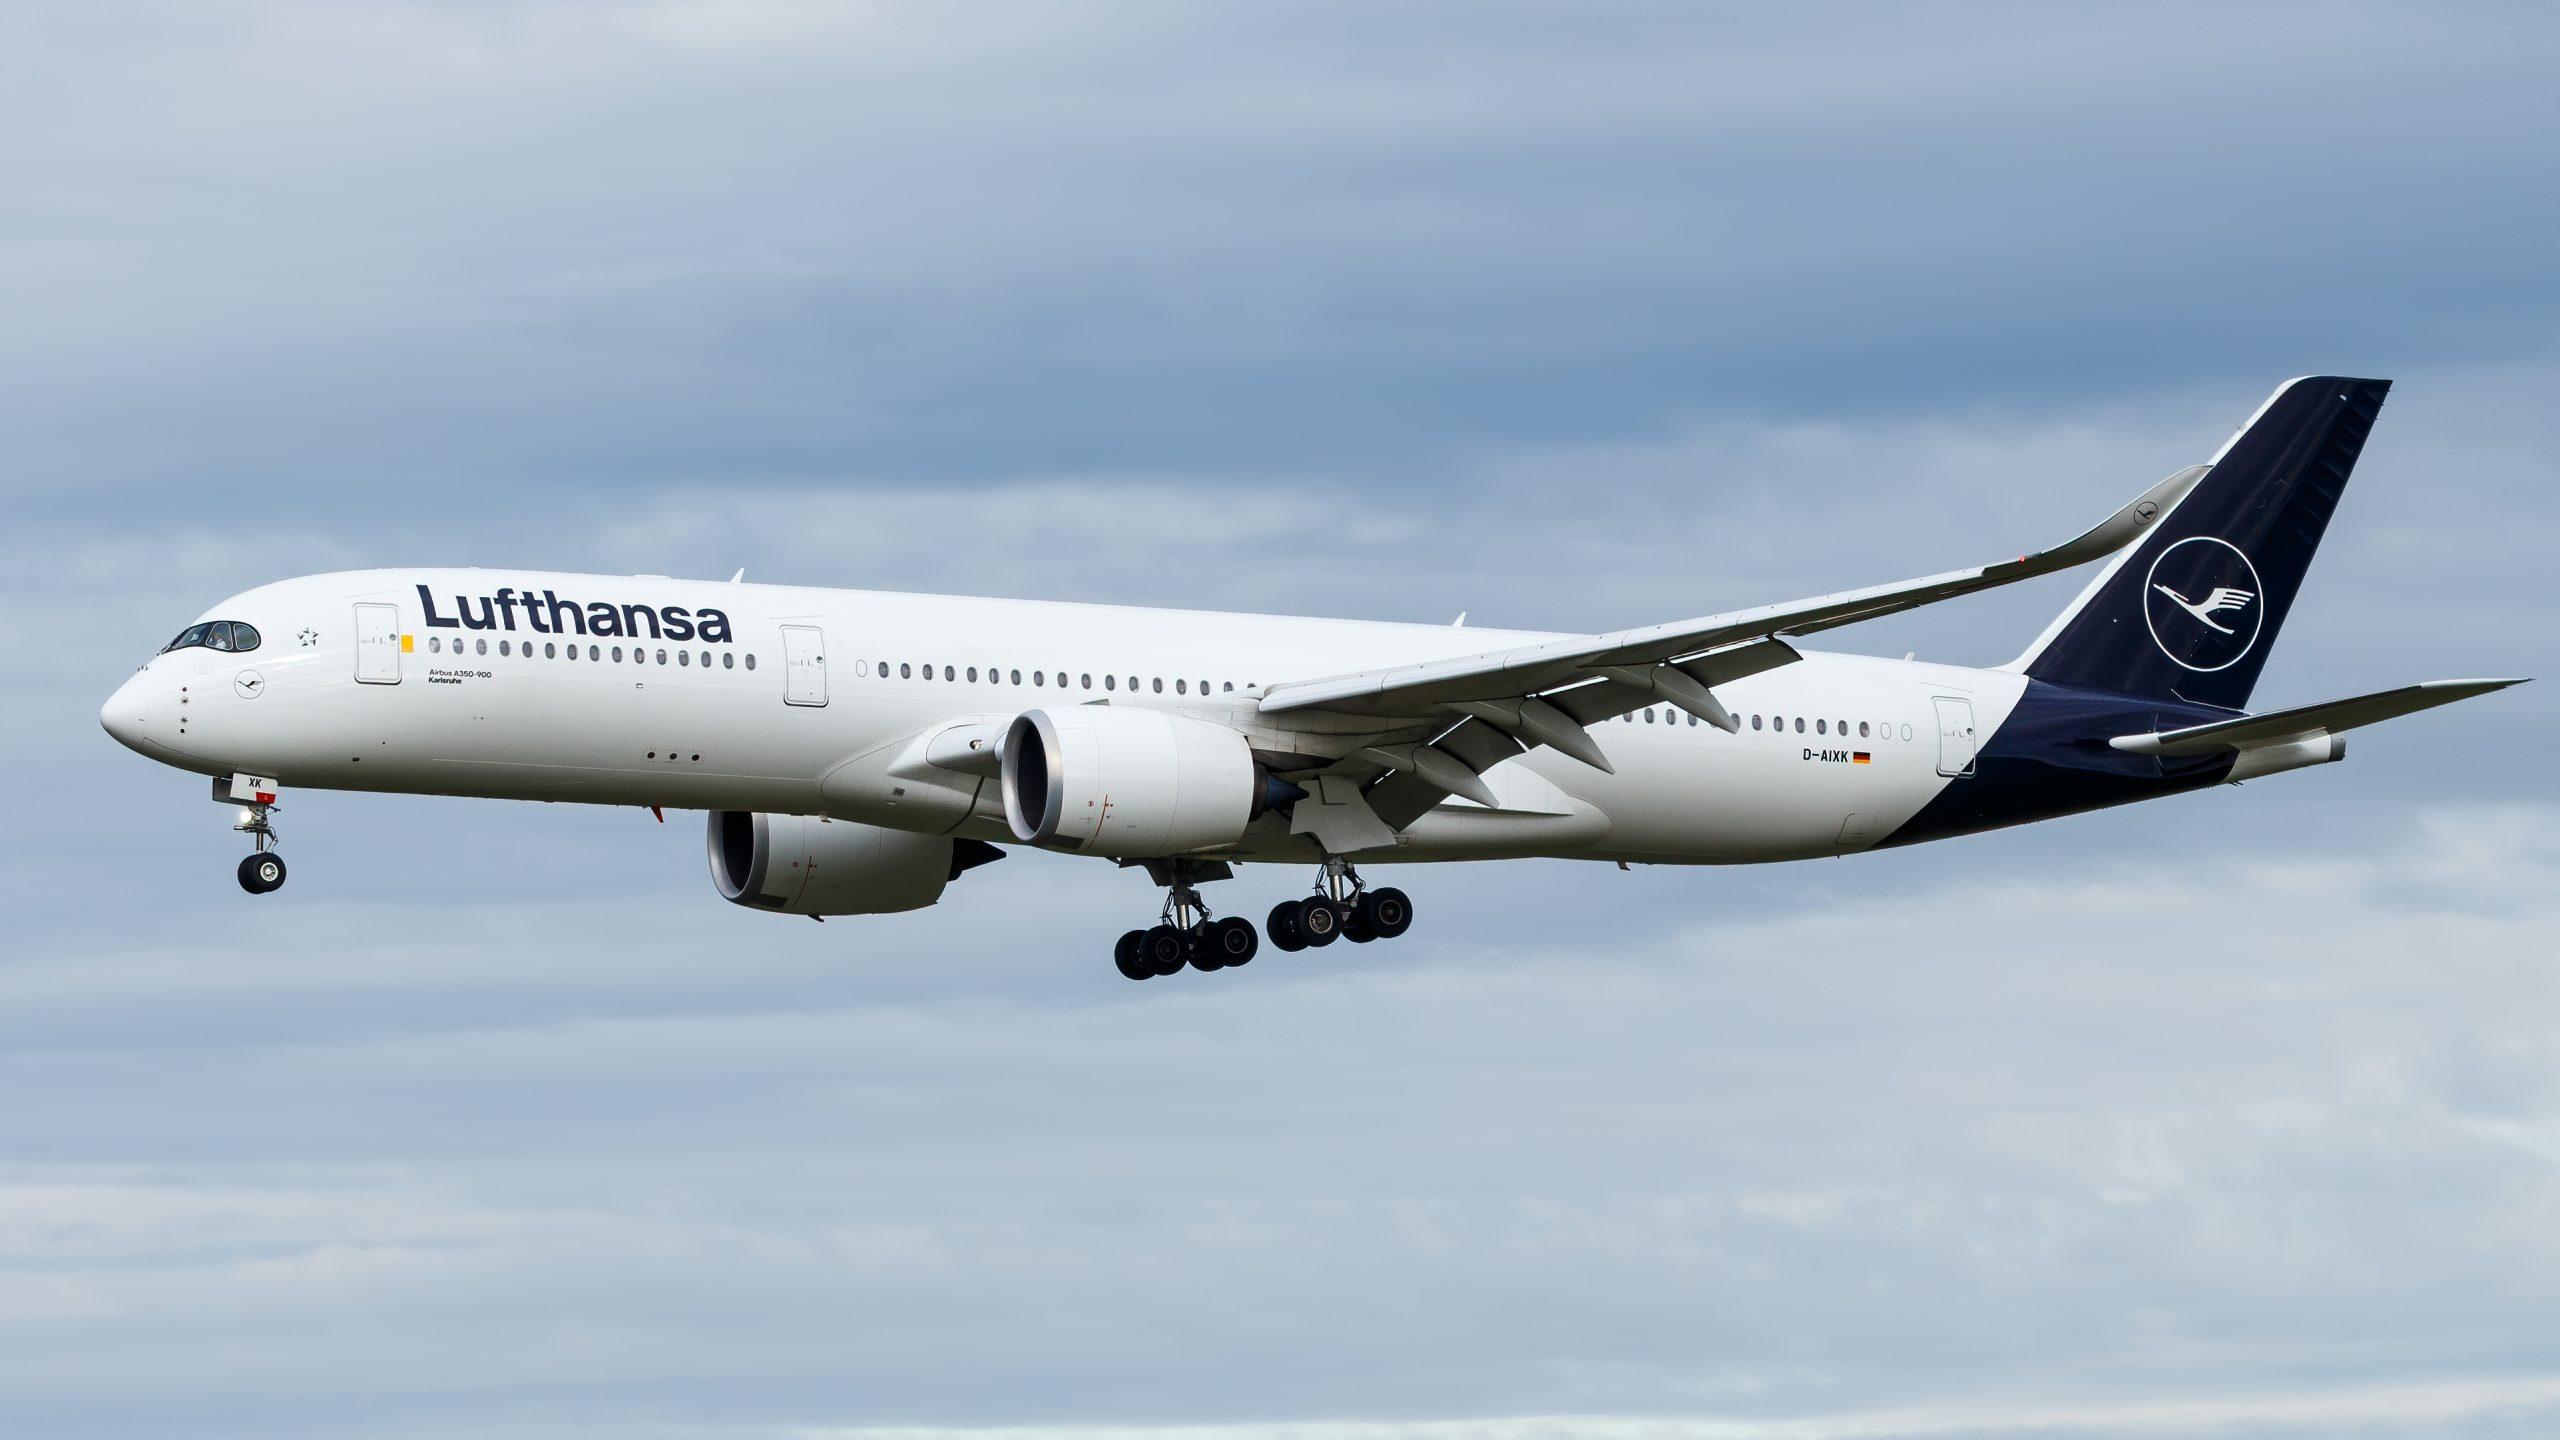 Airbus A350-900 fra Lufthansa med registreringen D-AIXK. (Foto: TJDarmstadt | CC 2.0)